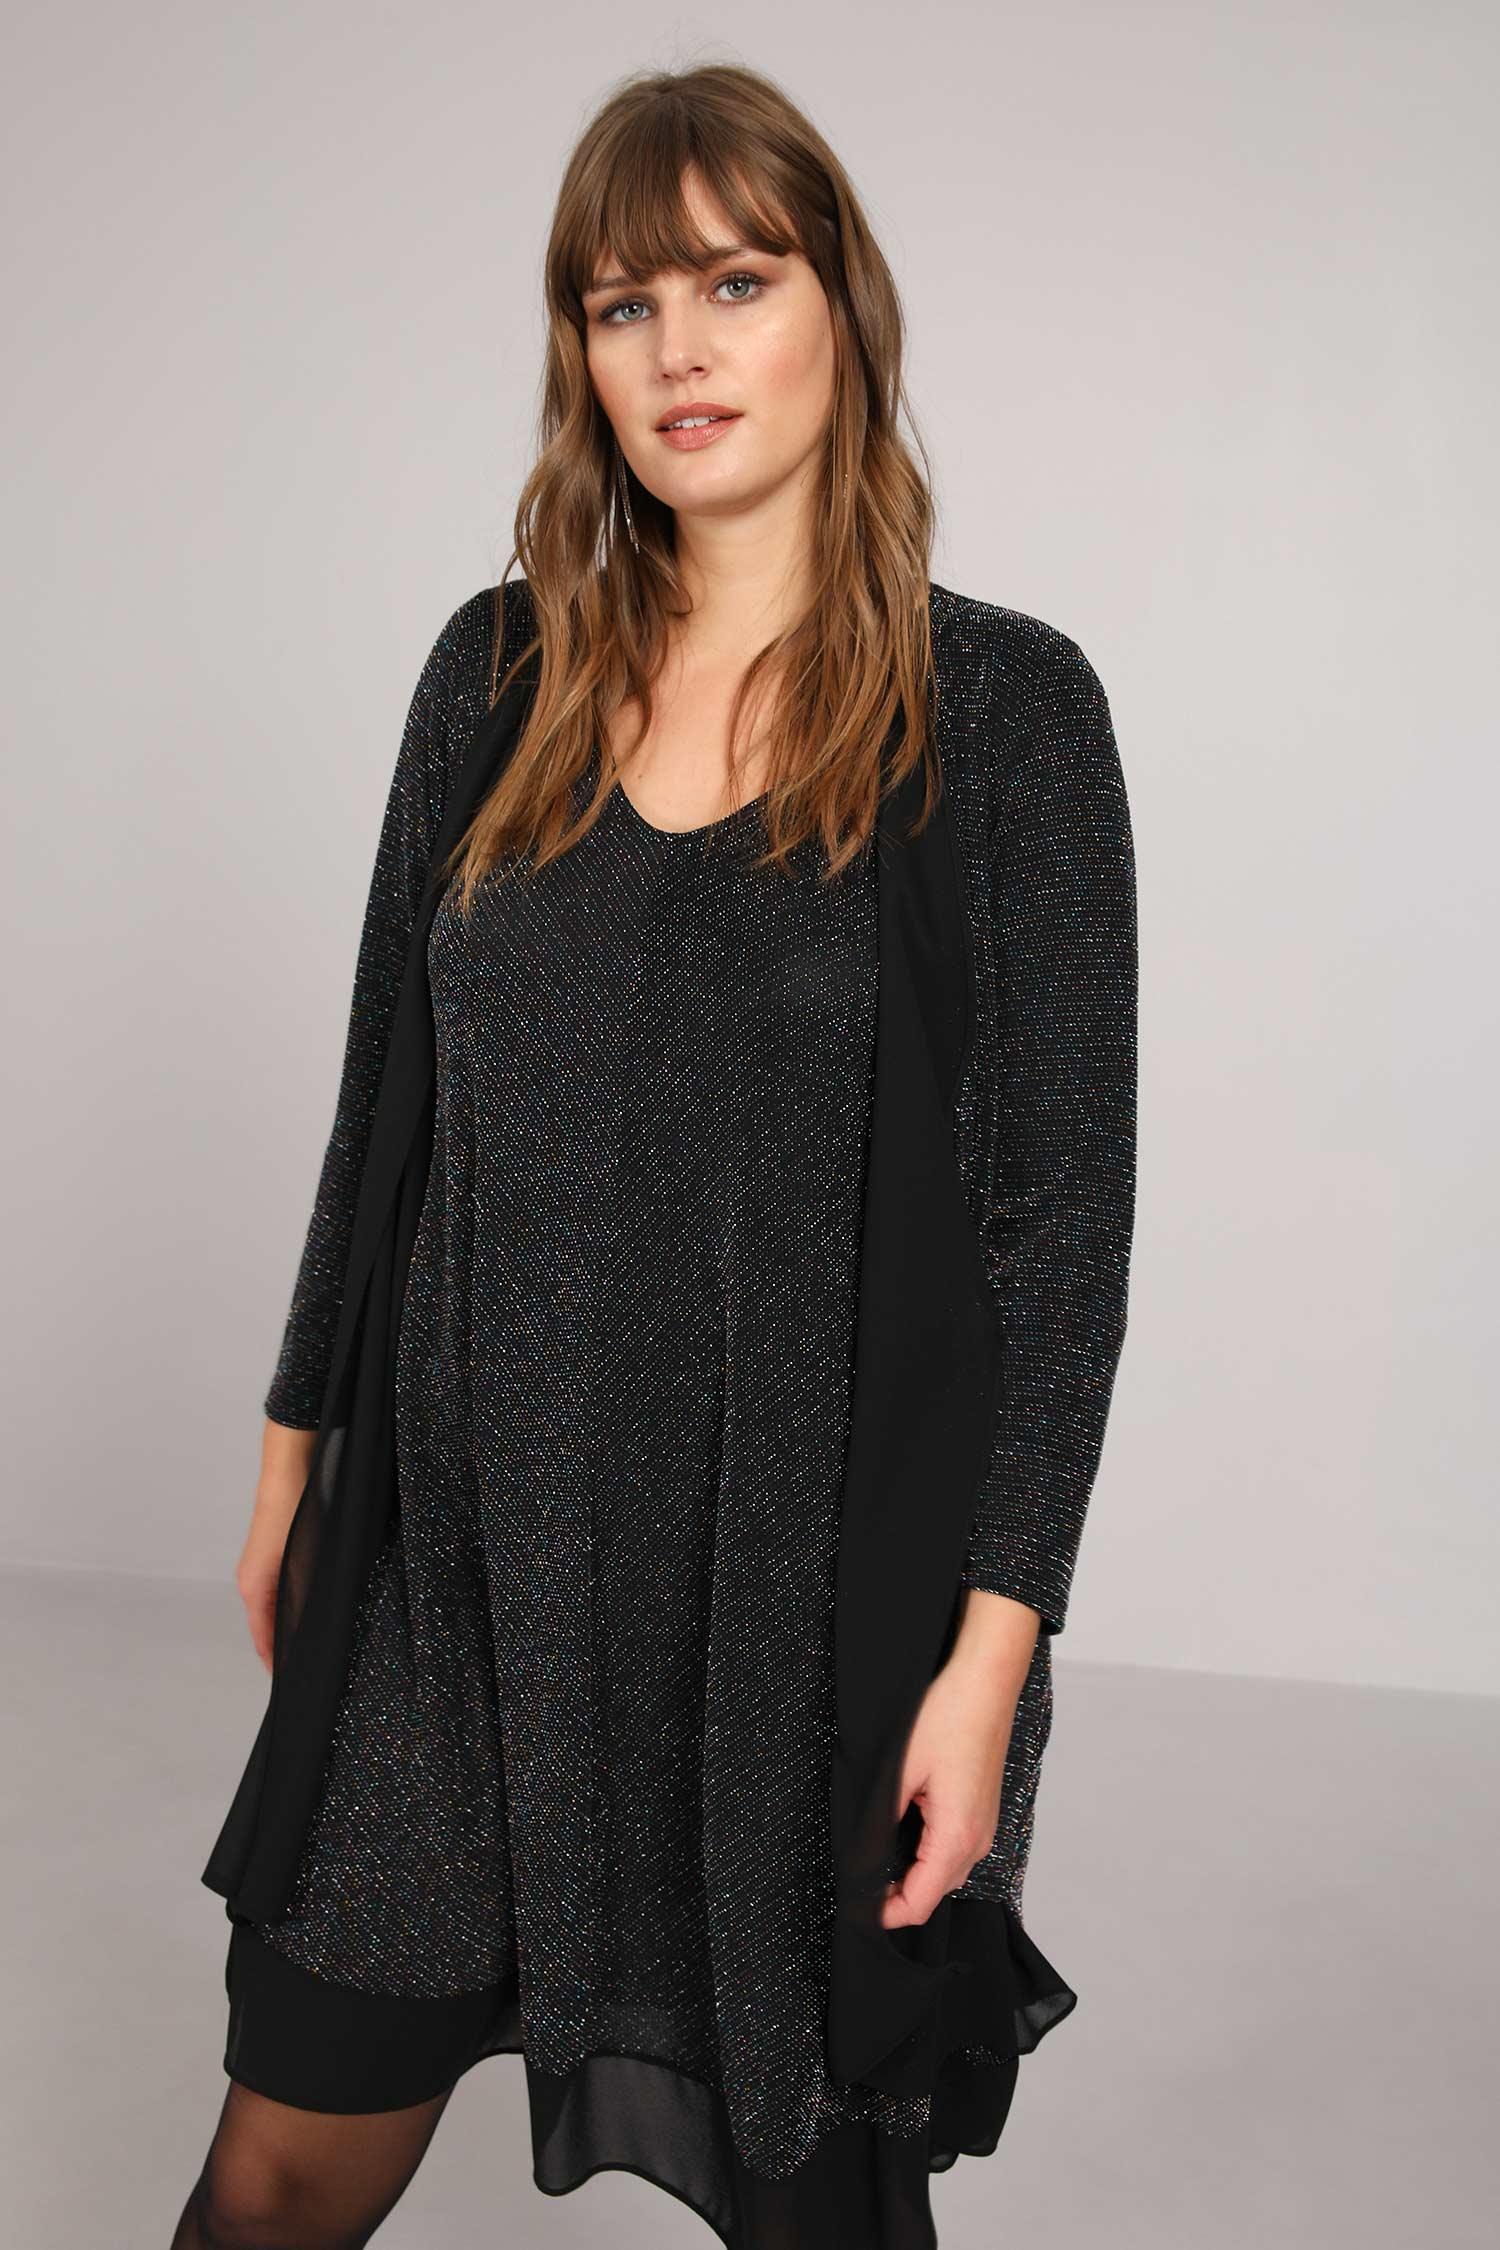 Straight vest in glittery knit